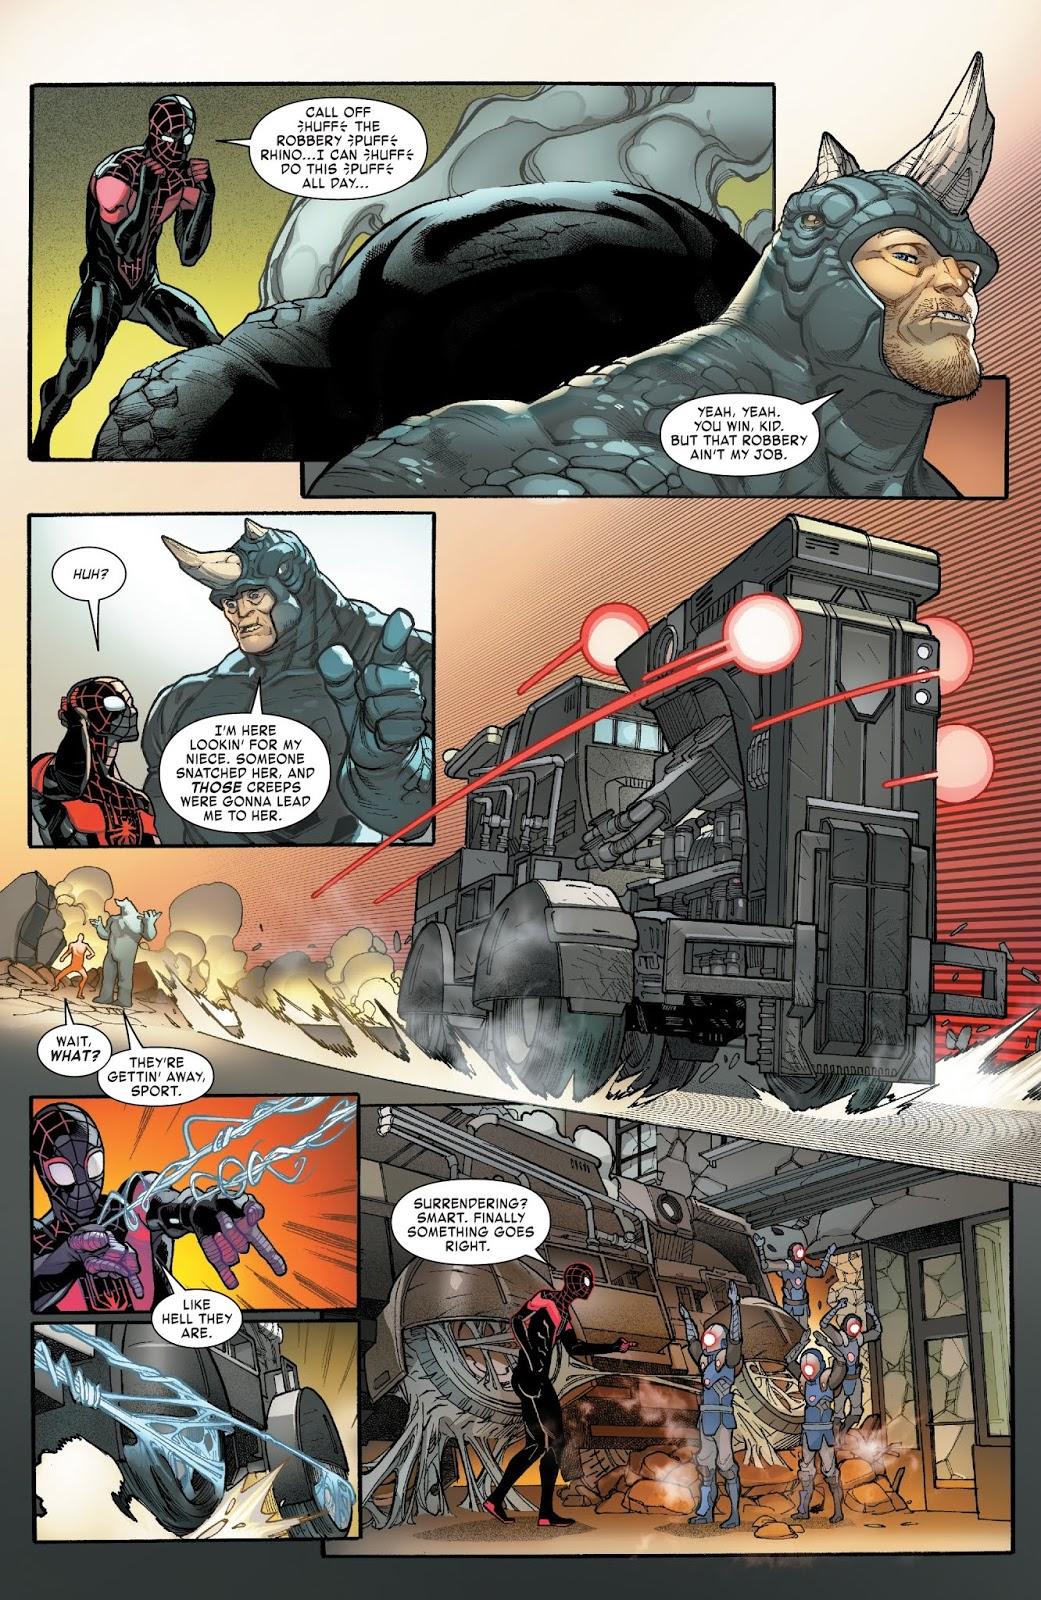 Spider-Man Miles Morales VS The Rhino